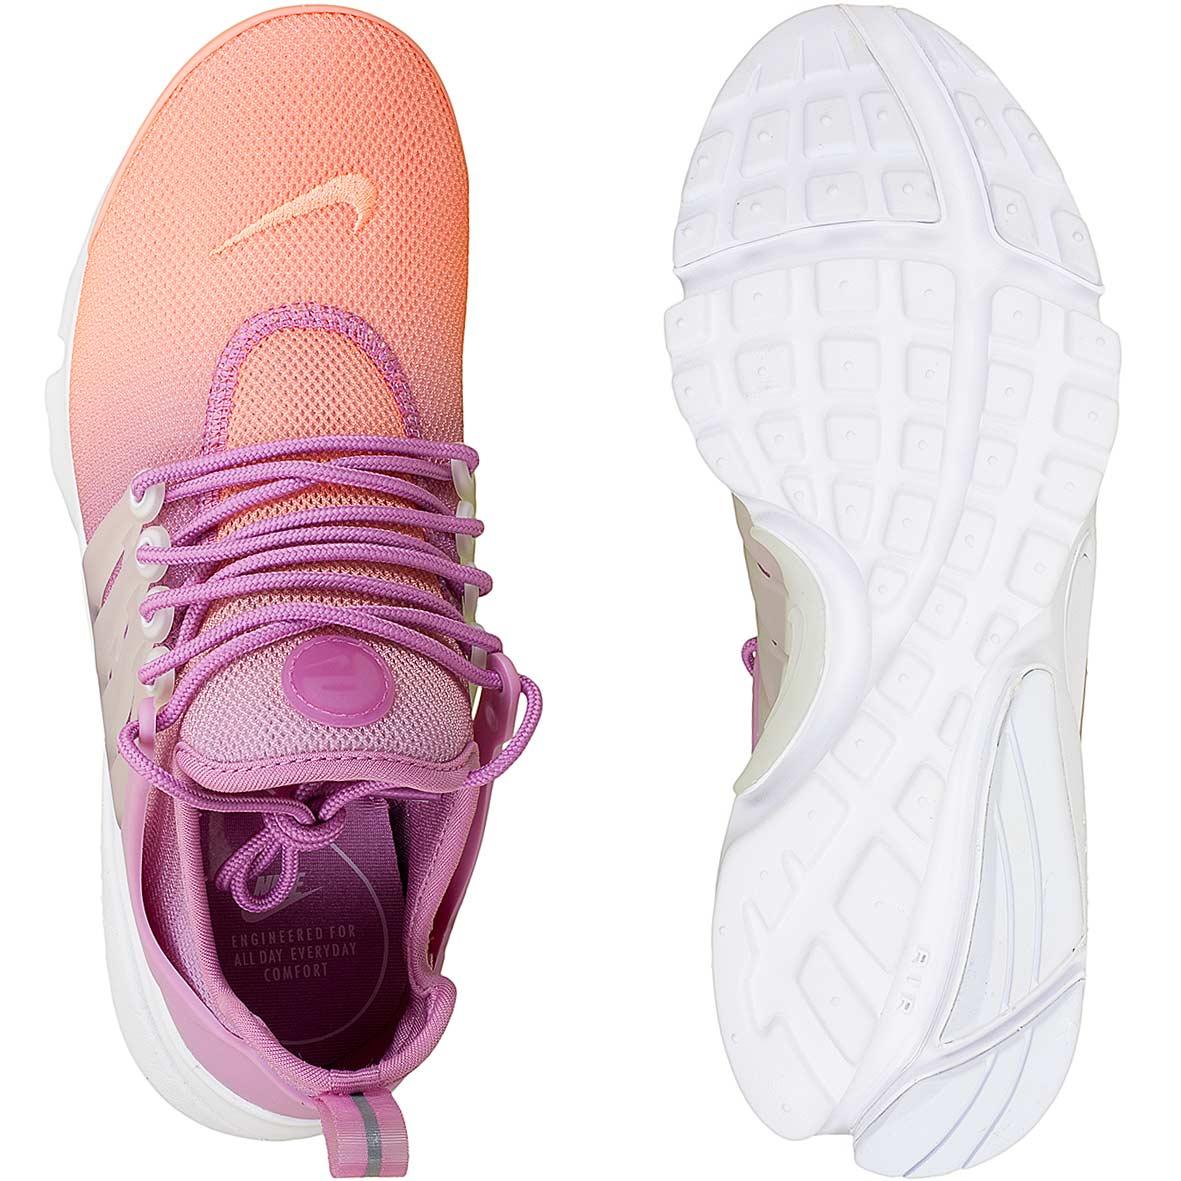 ☆ Nike Damen Sneaker Air Presto Ultra BR sunset/weiß - hier bestellen!